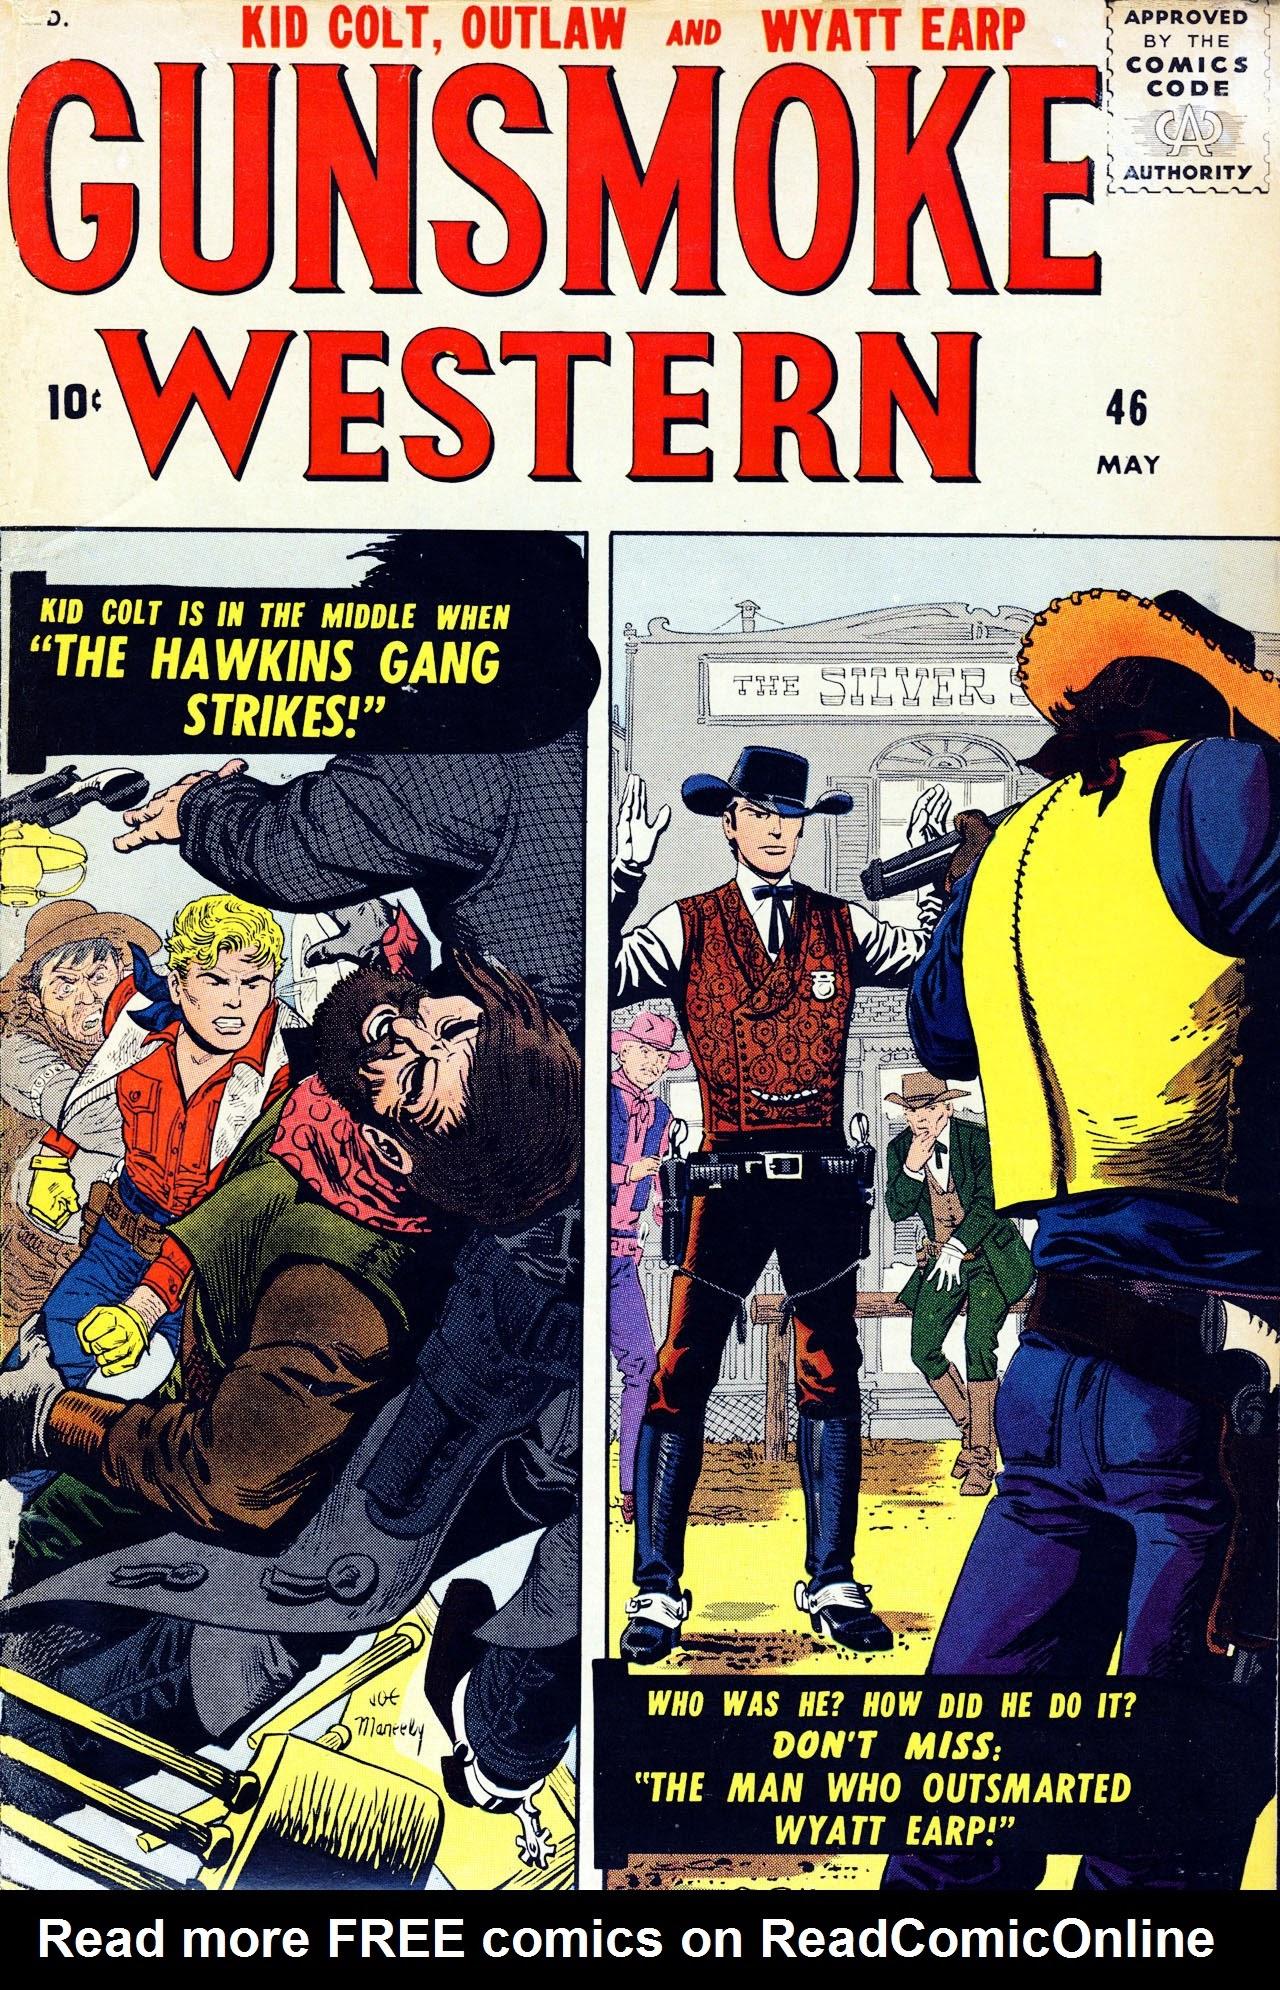 Gunsmoke Western 46 Page 1